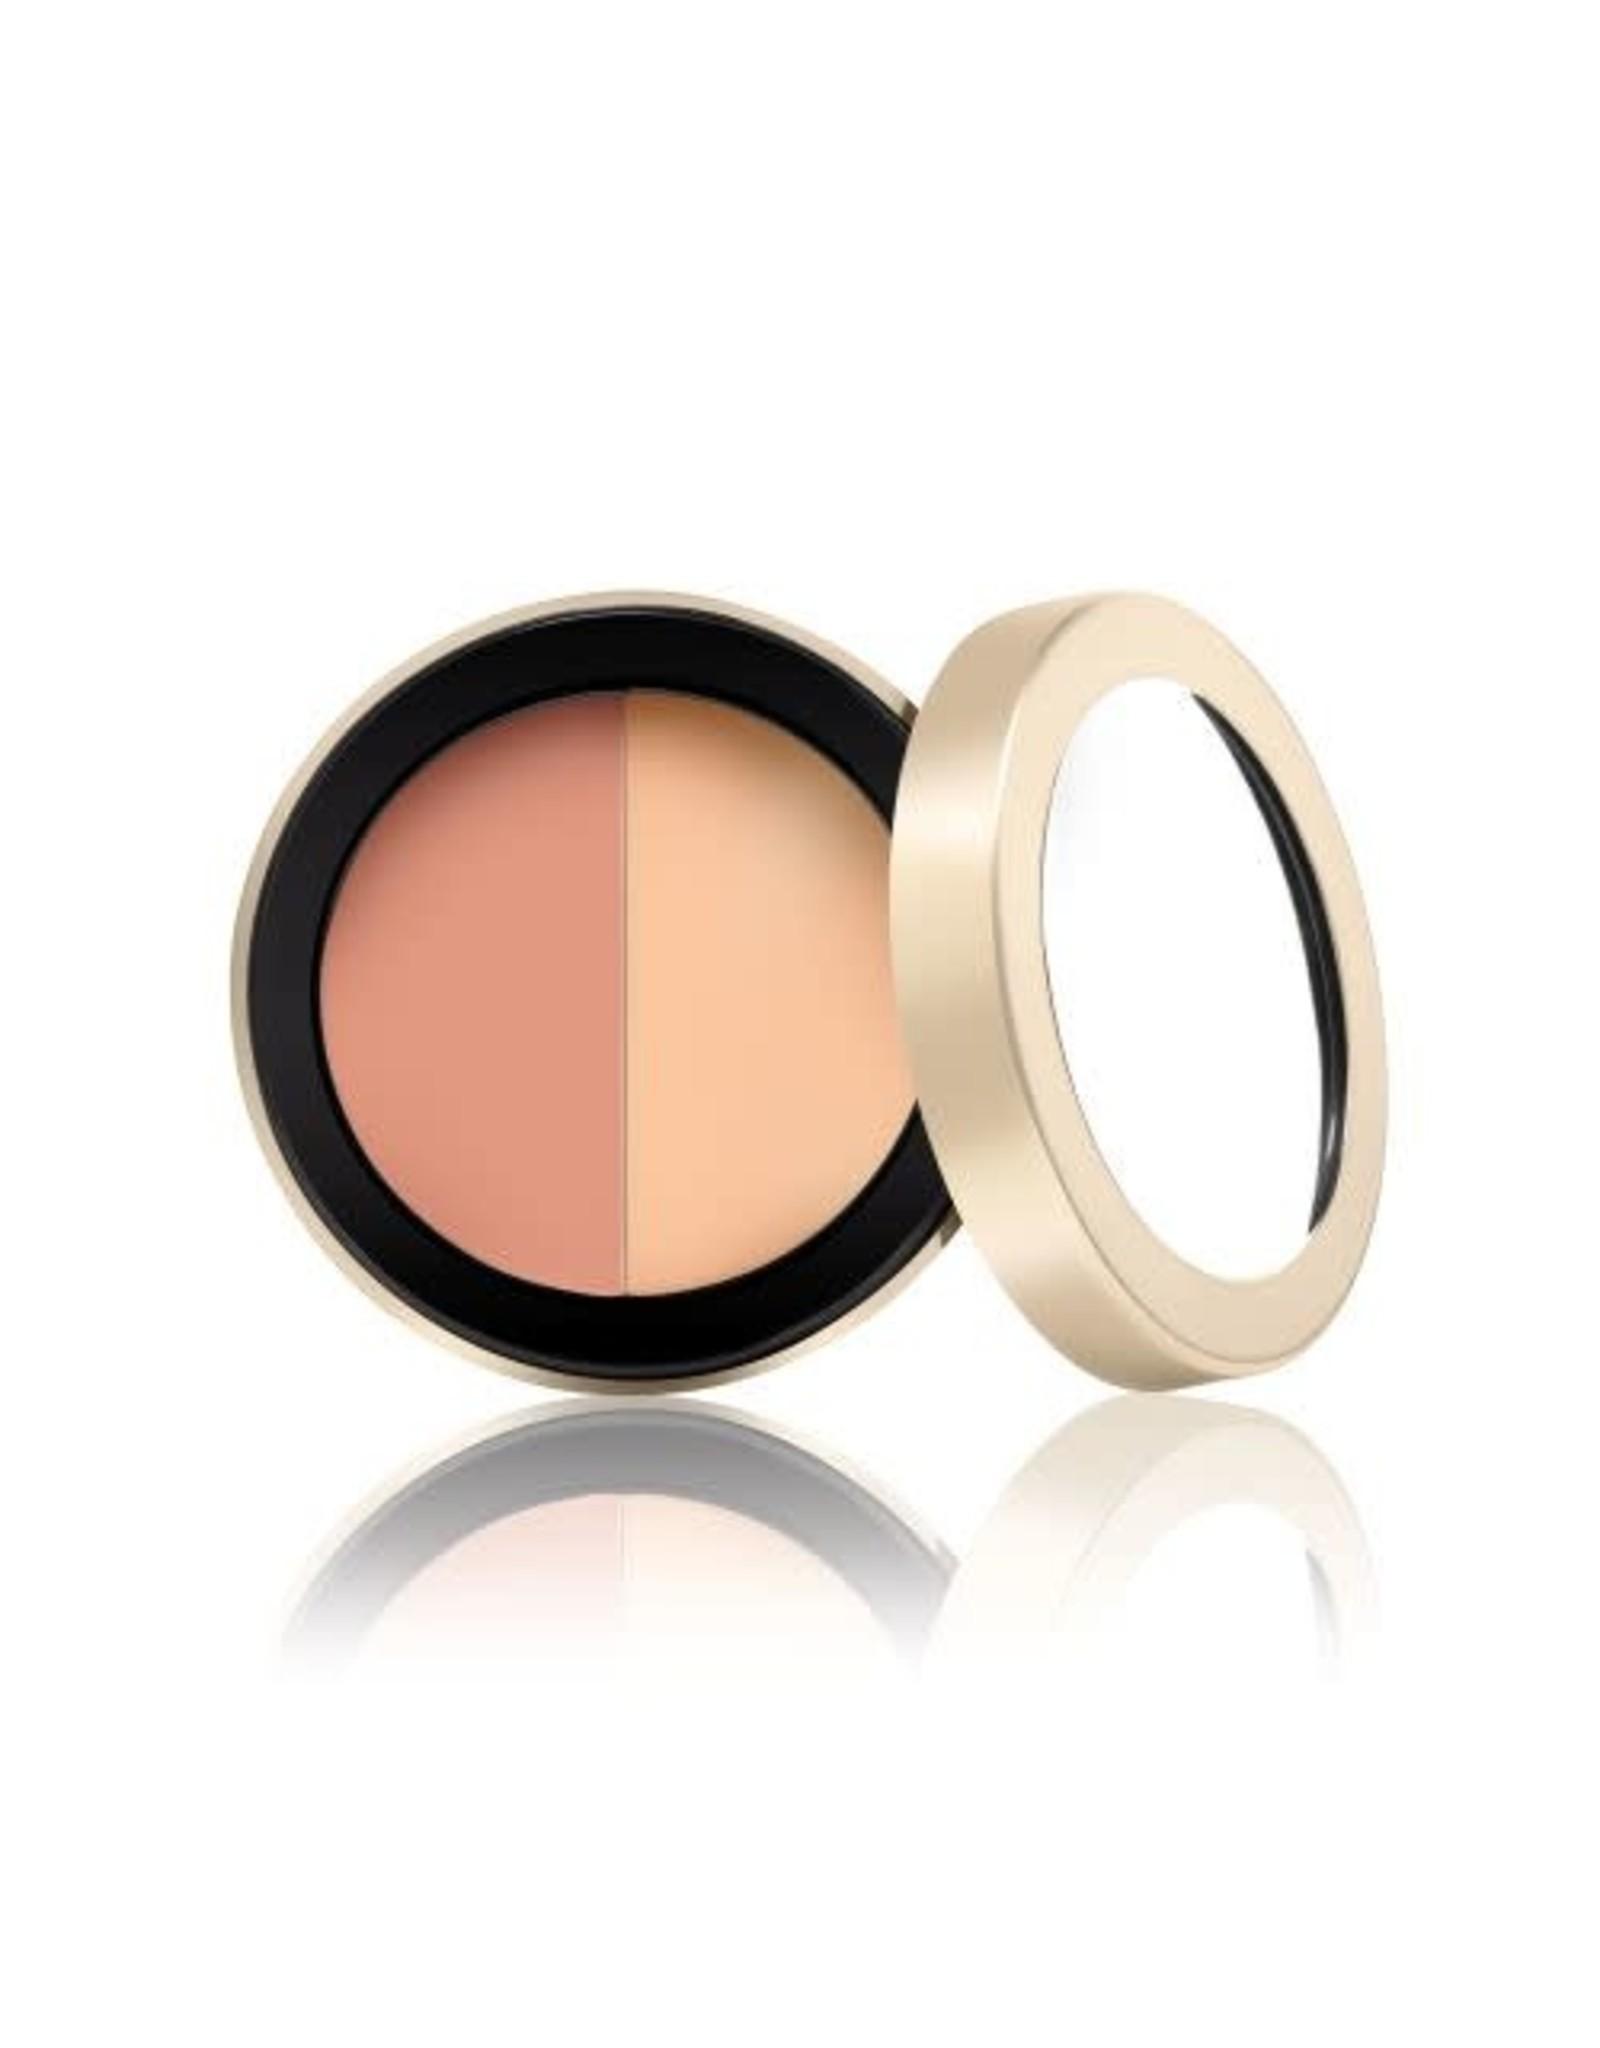 Jane Iredale Circle Delete #2 (Peach) Concealer